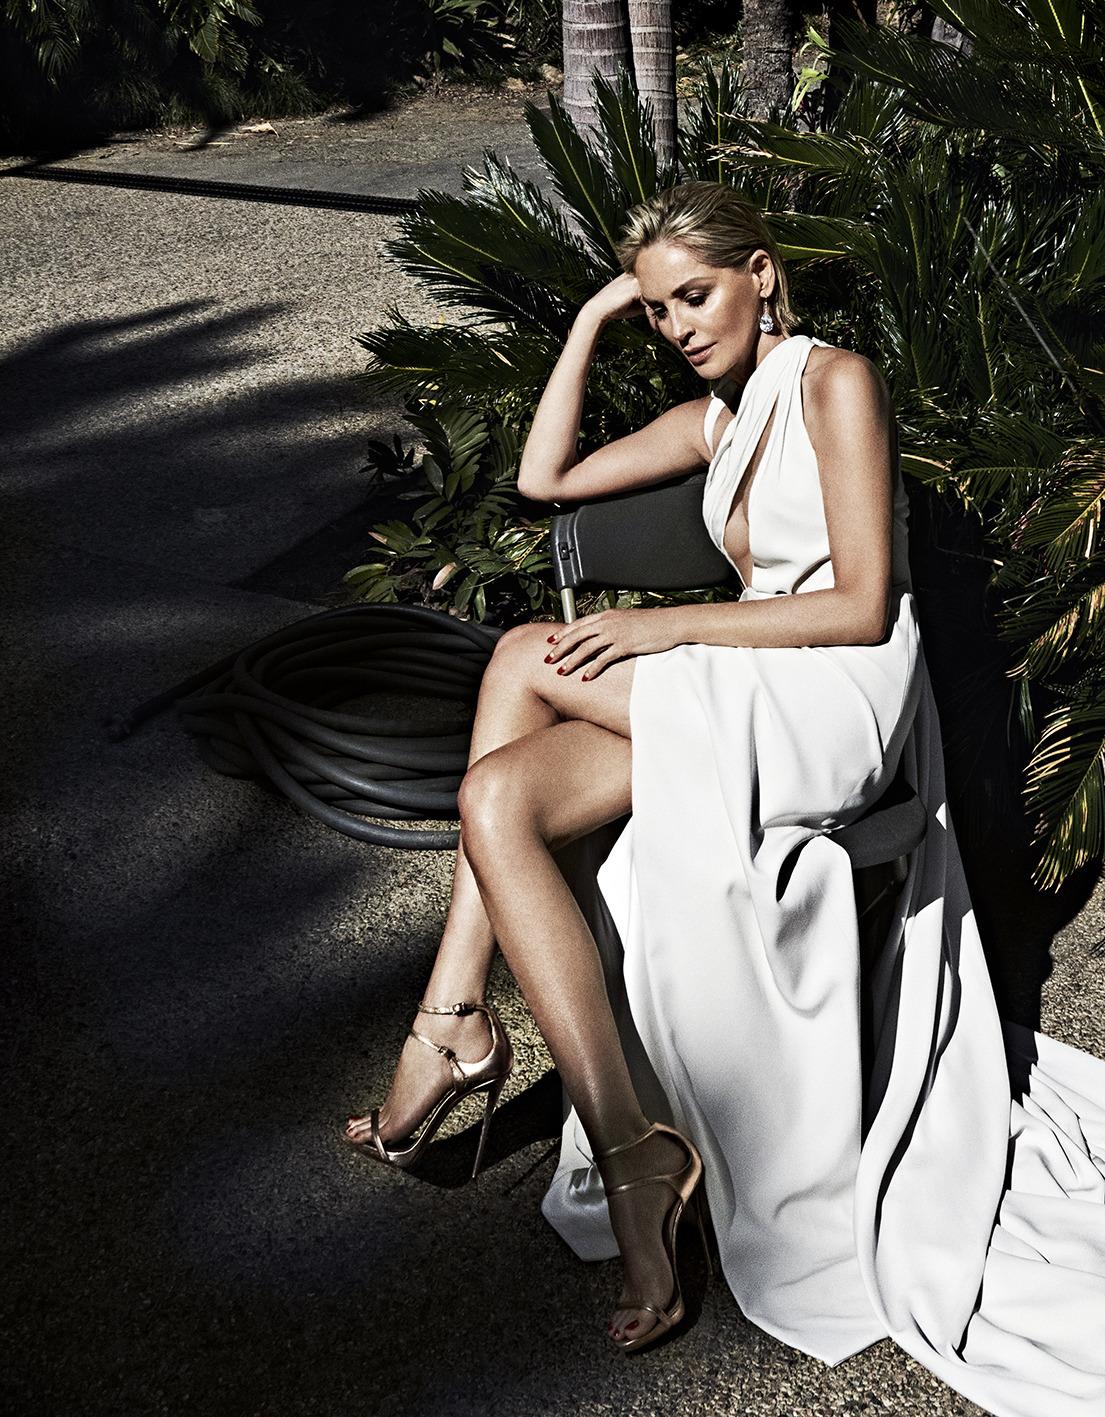 Sharon Stone by Branislav Simoncik for Vogue Portugal May 2019 (18).jpg